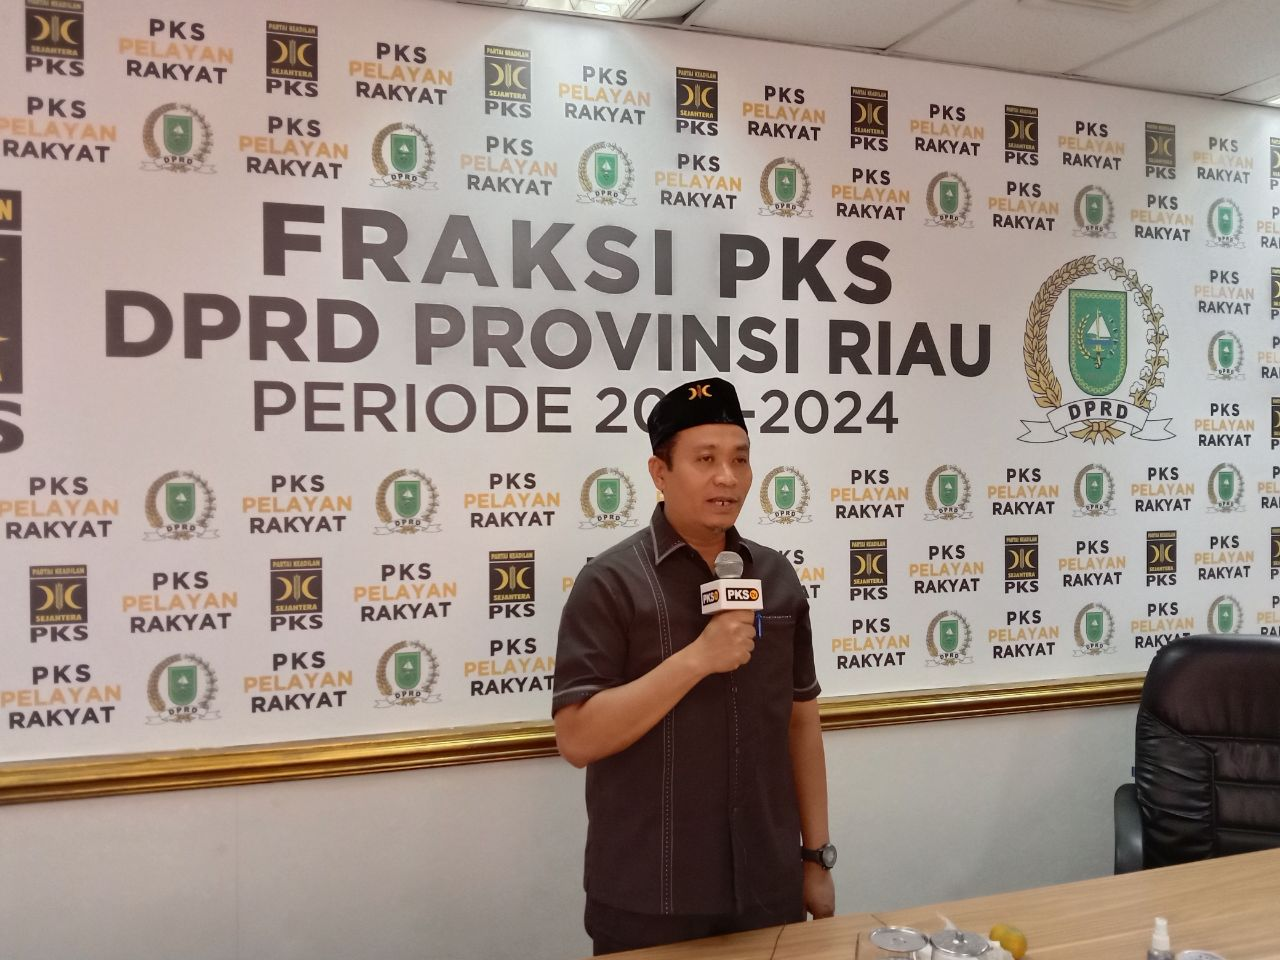 F-PKS DPRD Riau Kembali Adakan Lomba Baca Kitab Kuning